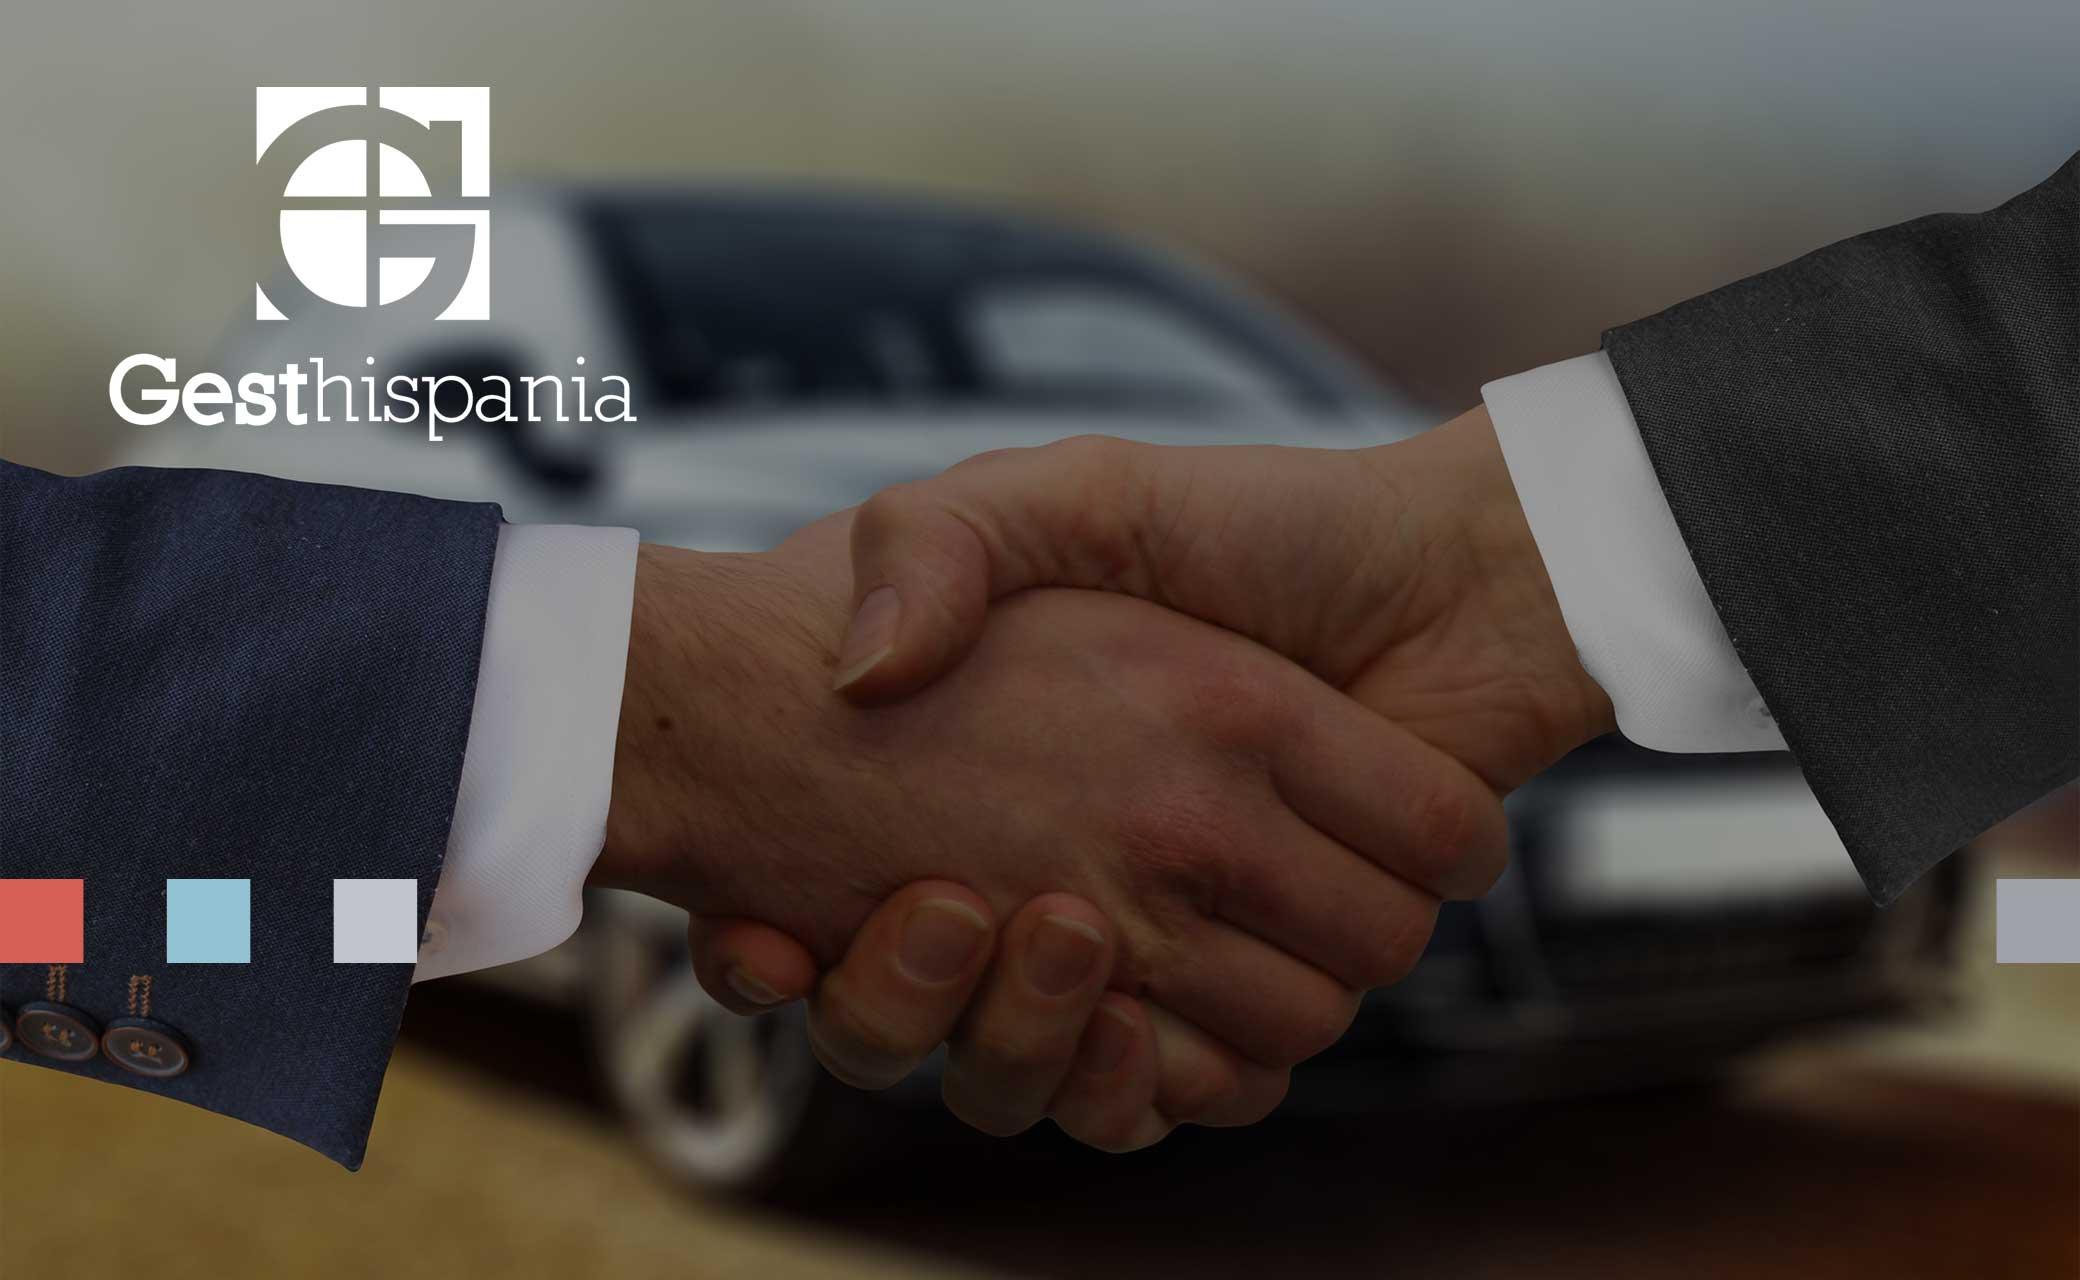 Gesthispania - Datos matriculaciones enero 2020